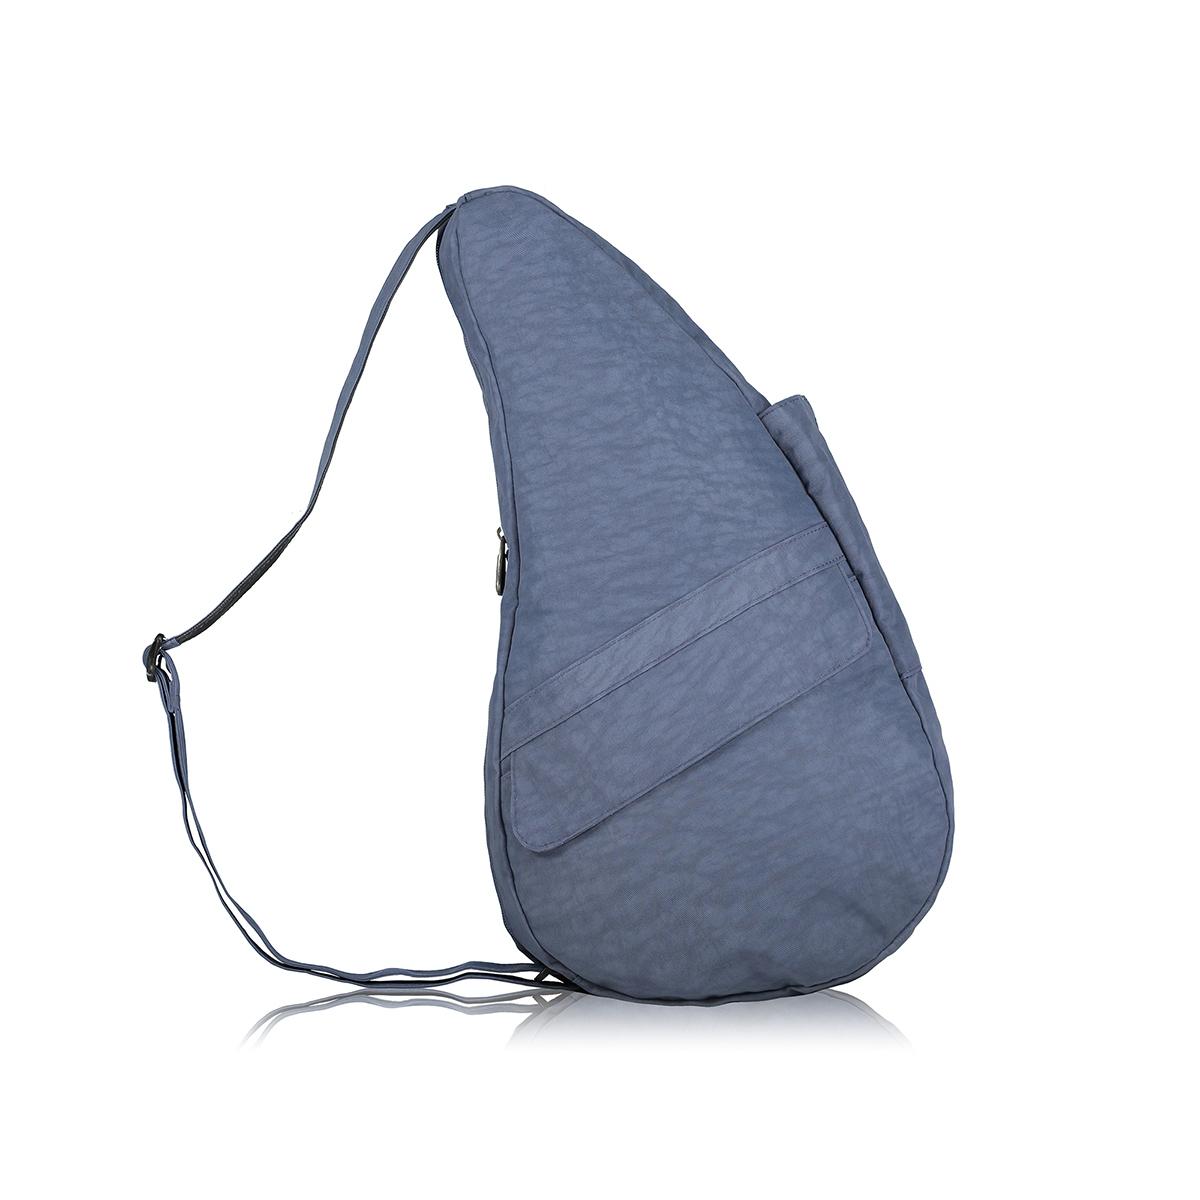 Healthy Back Bag/ヘルシーバックバッグ/ショルダーバッグ/ボディバッグ/旅行バッグ/軽量/レディース/メンズ 《限定ポーチ付》 公式ストア ヘルシーバックバッグ テクスチャードナイロン Mサイズ ヴィンテージインディゴ